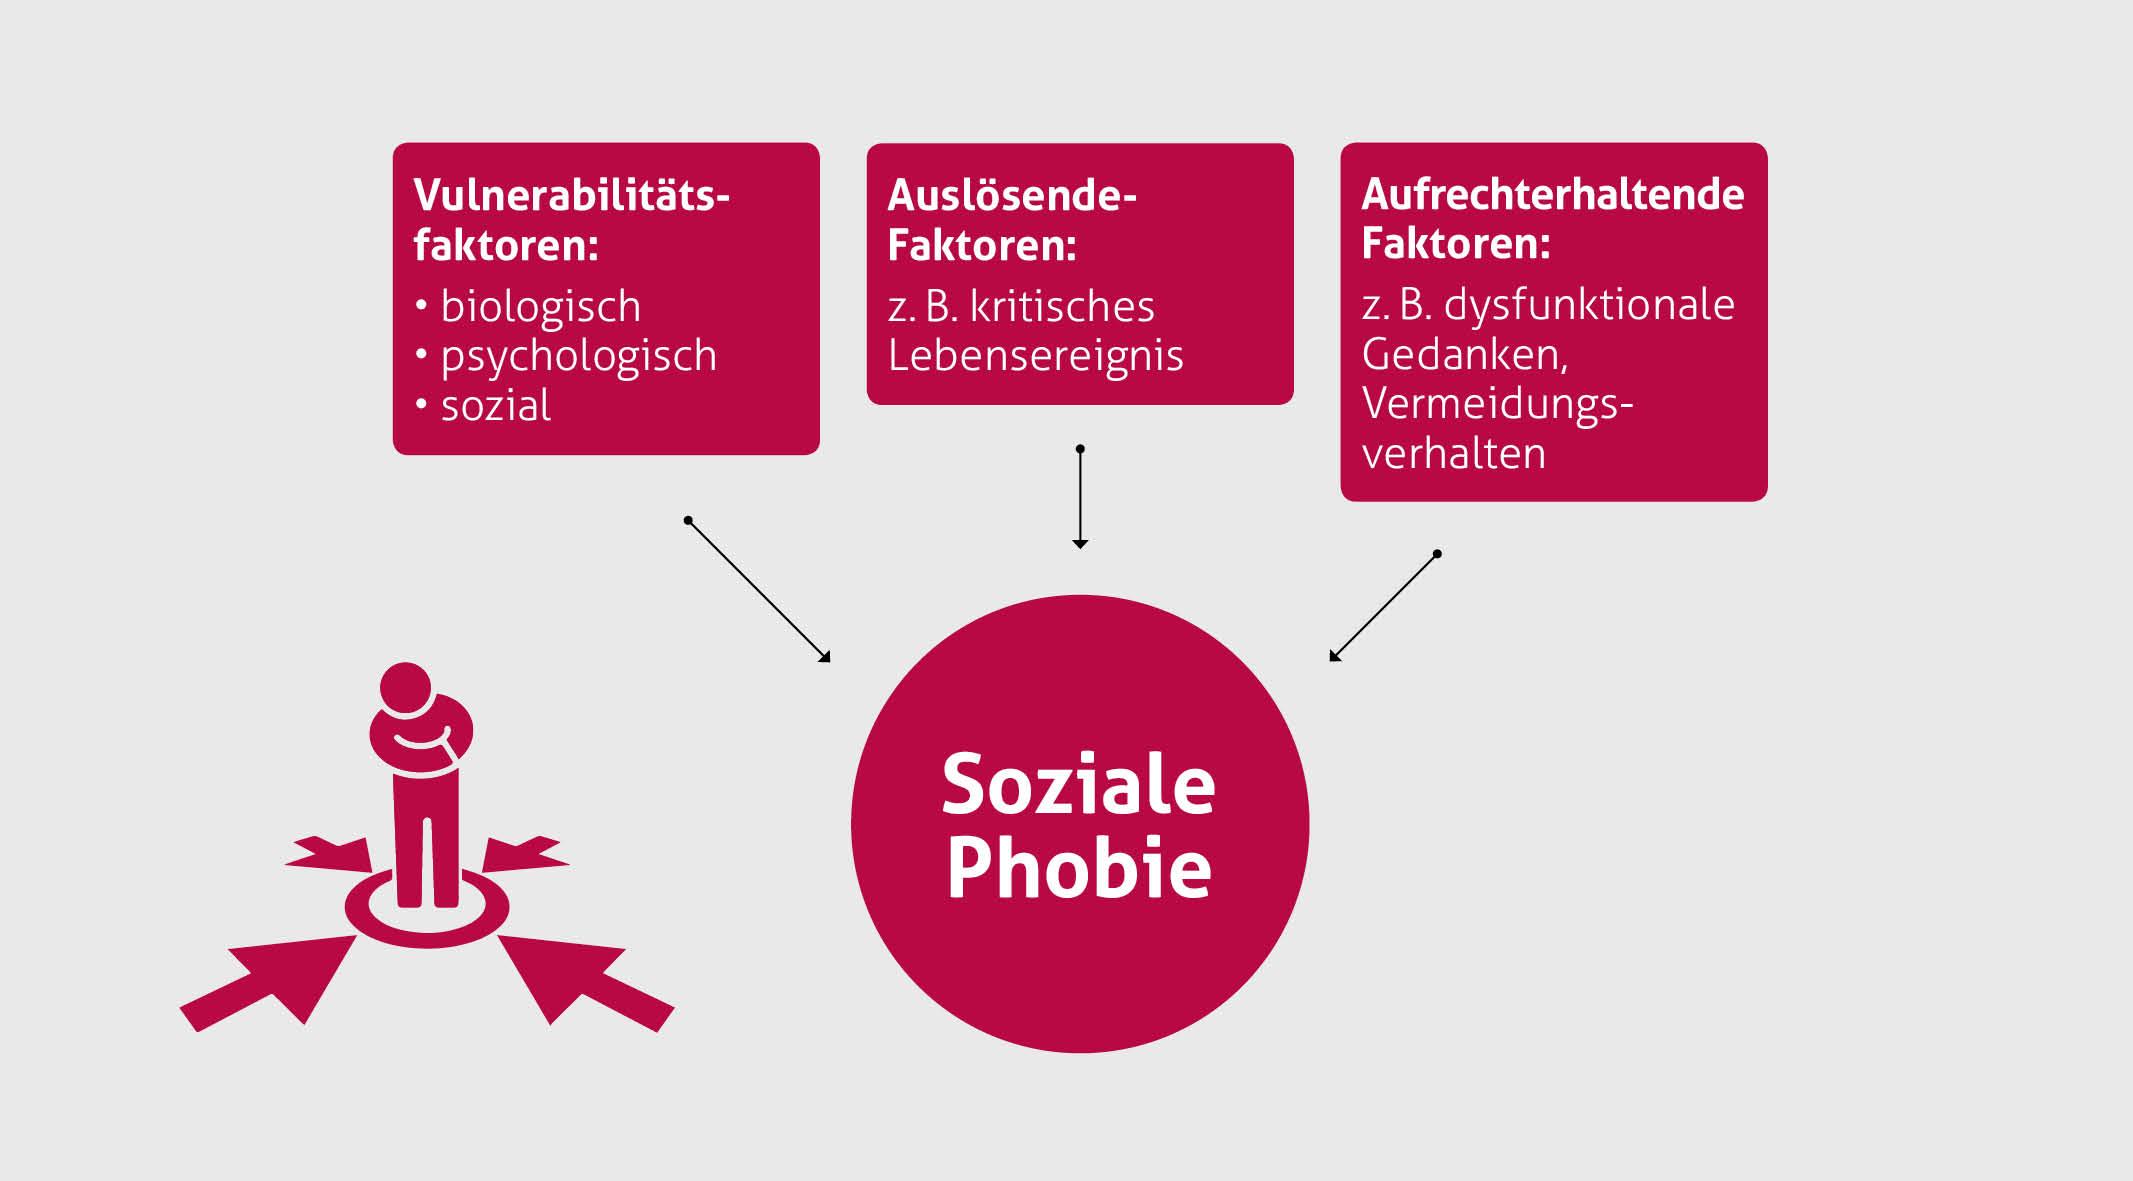 Sozialer phobie